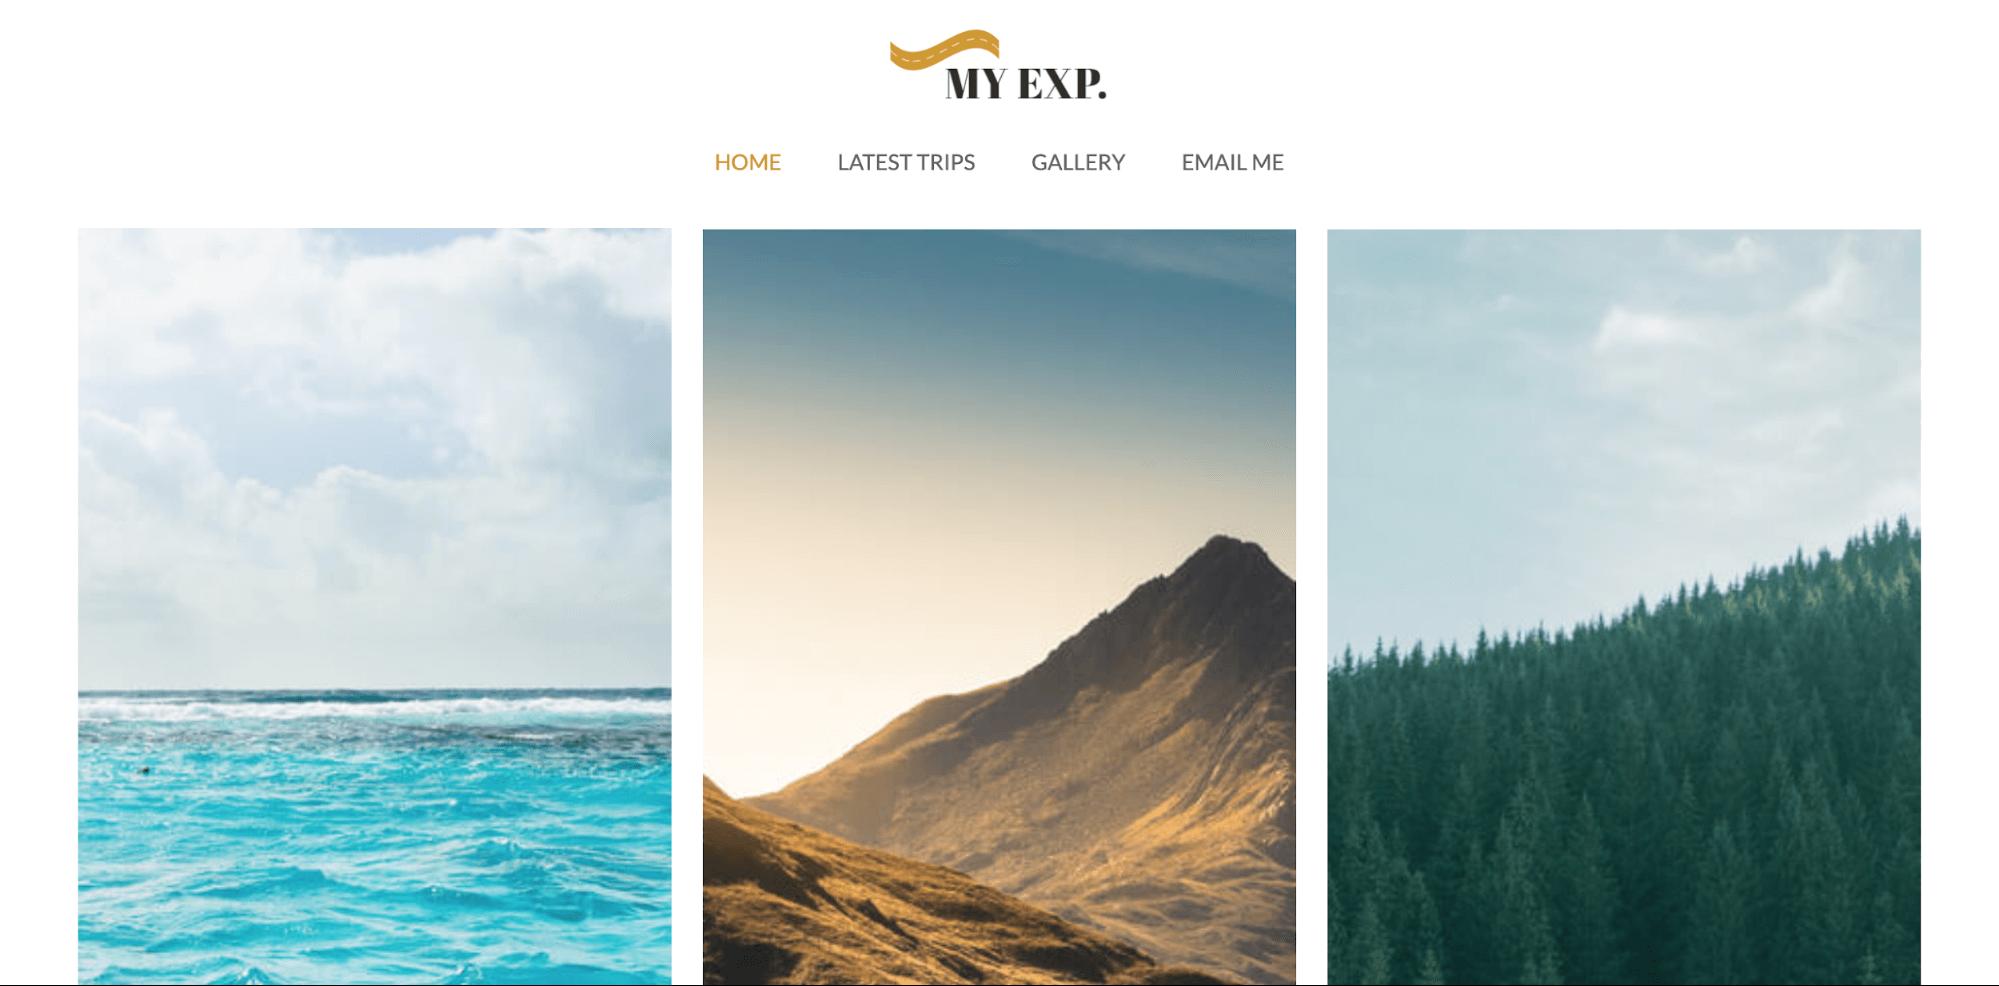 Myexp-tourism website template-ucraft